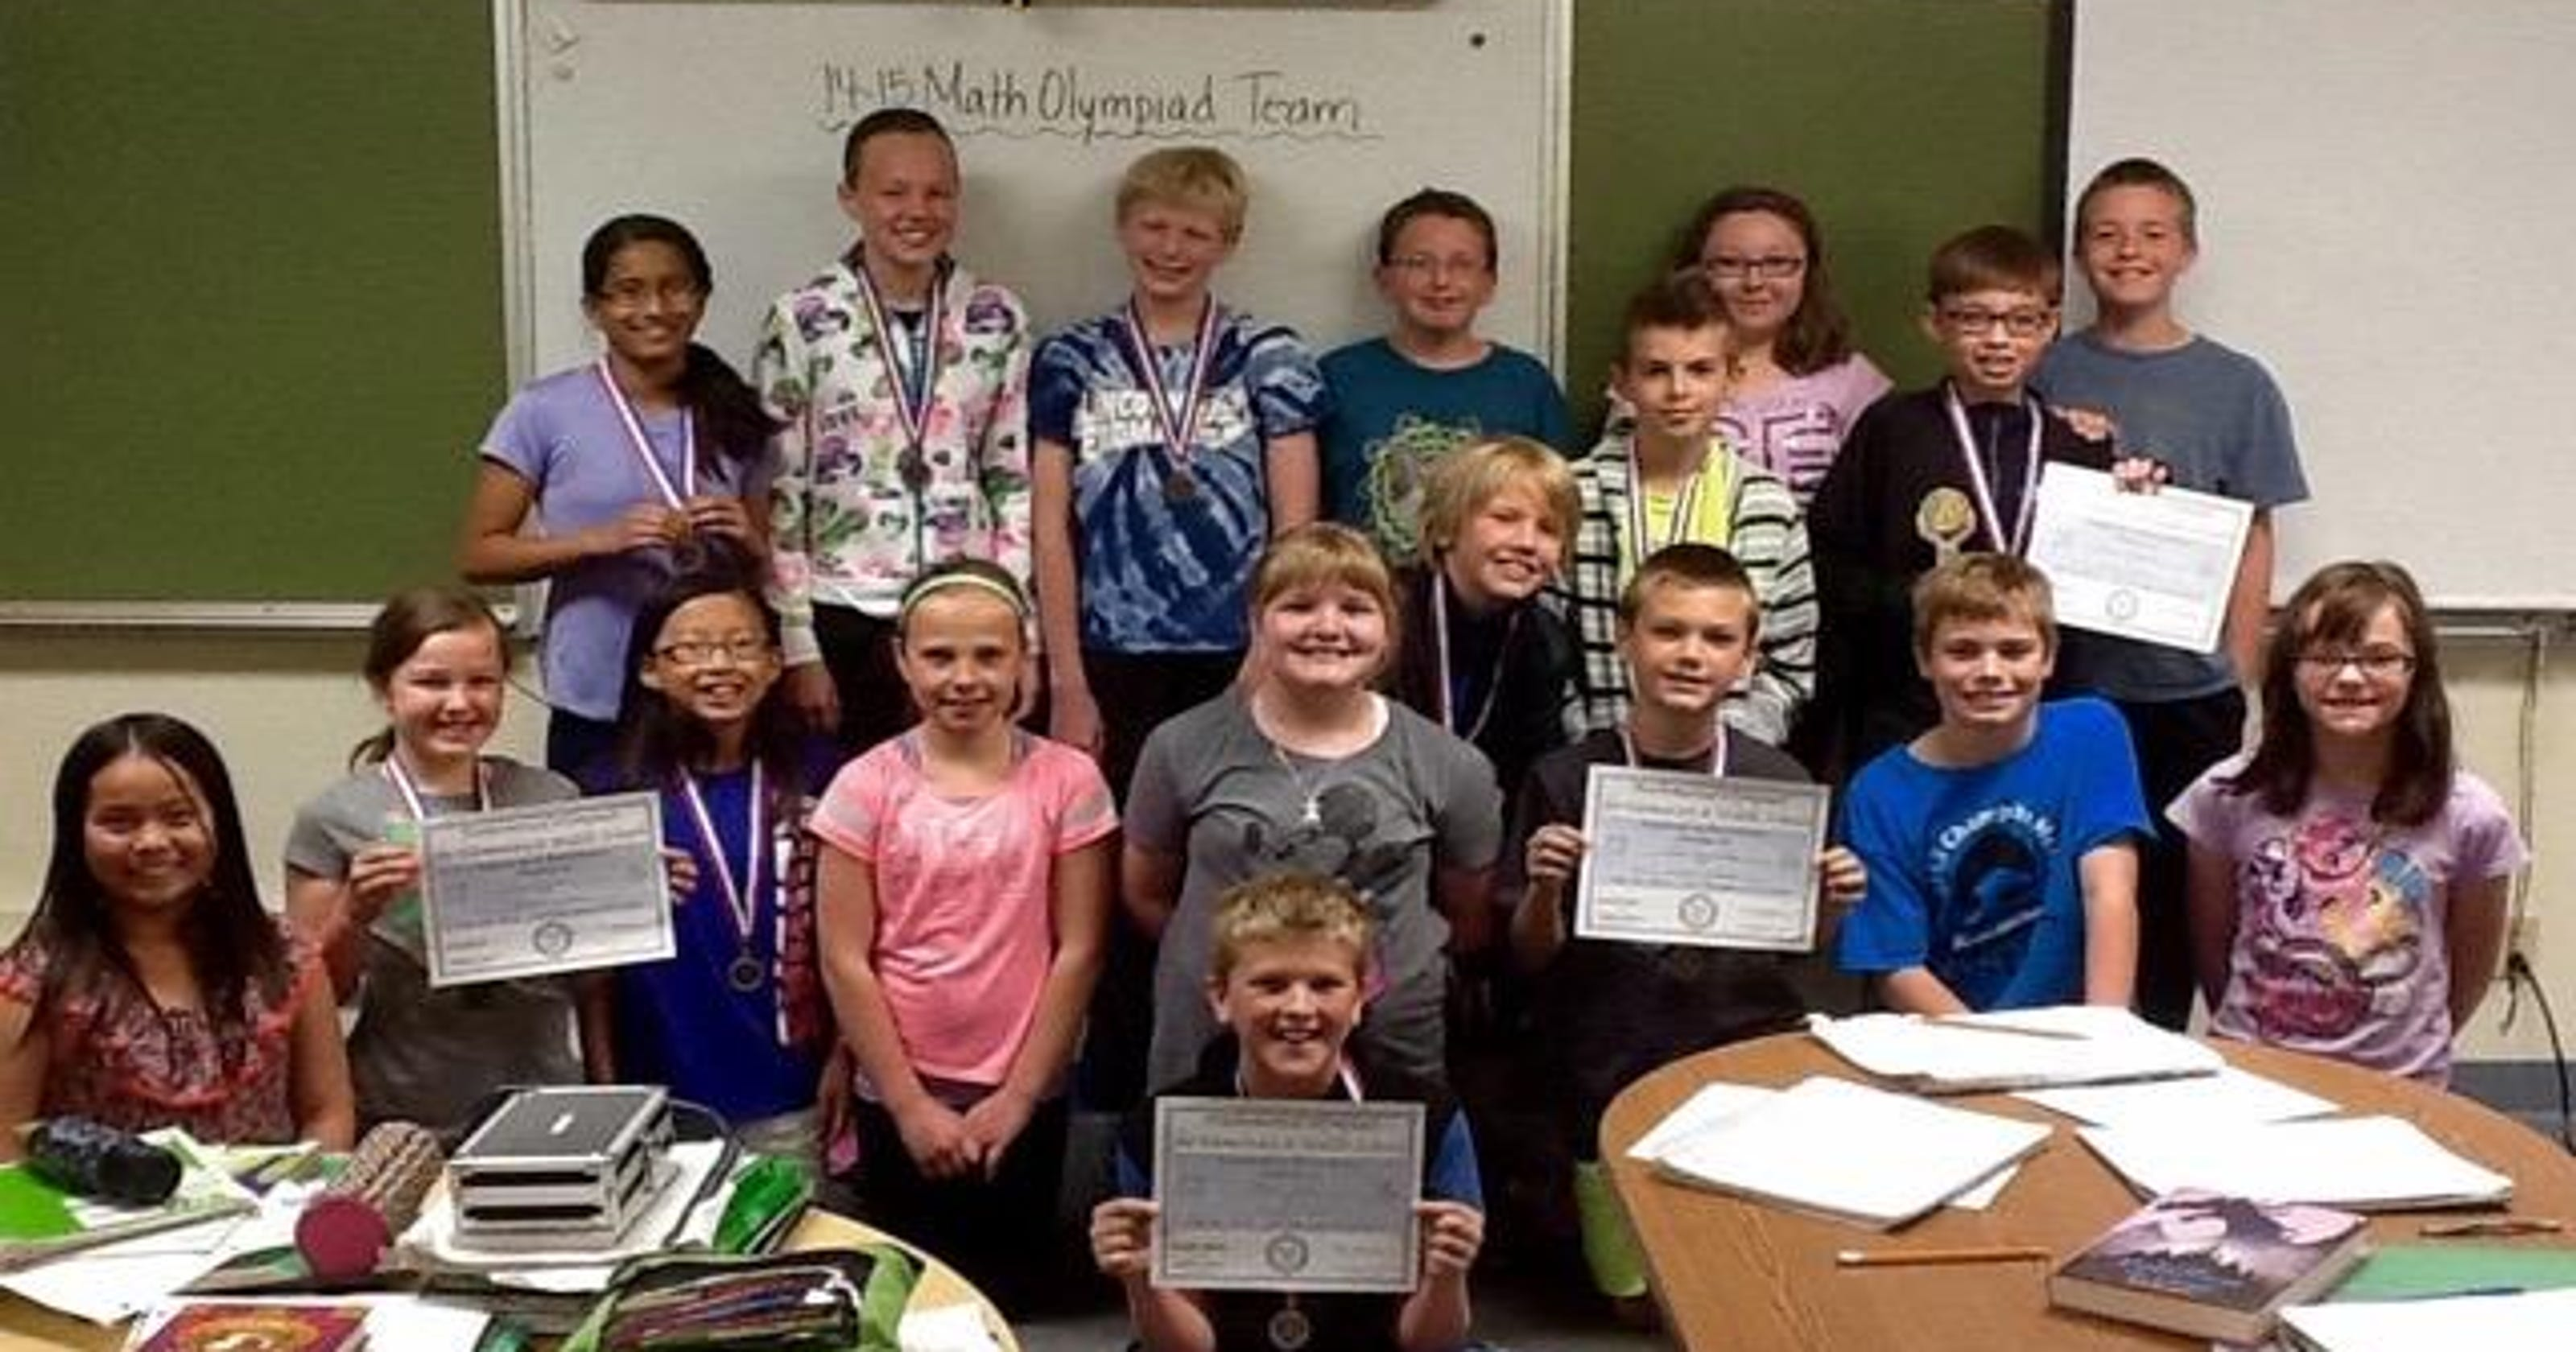 Lincoln-Erdman Math Olympiad Team ends season